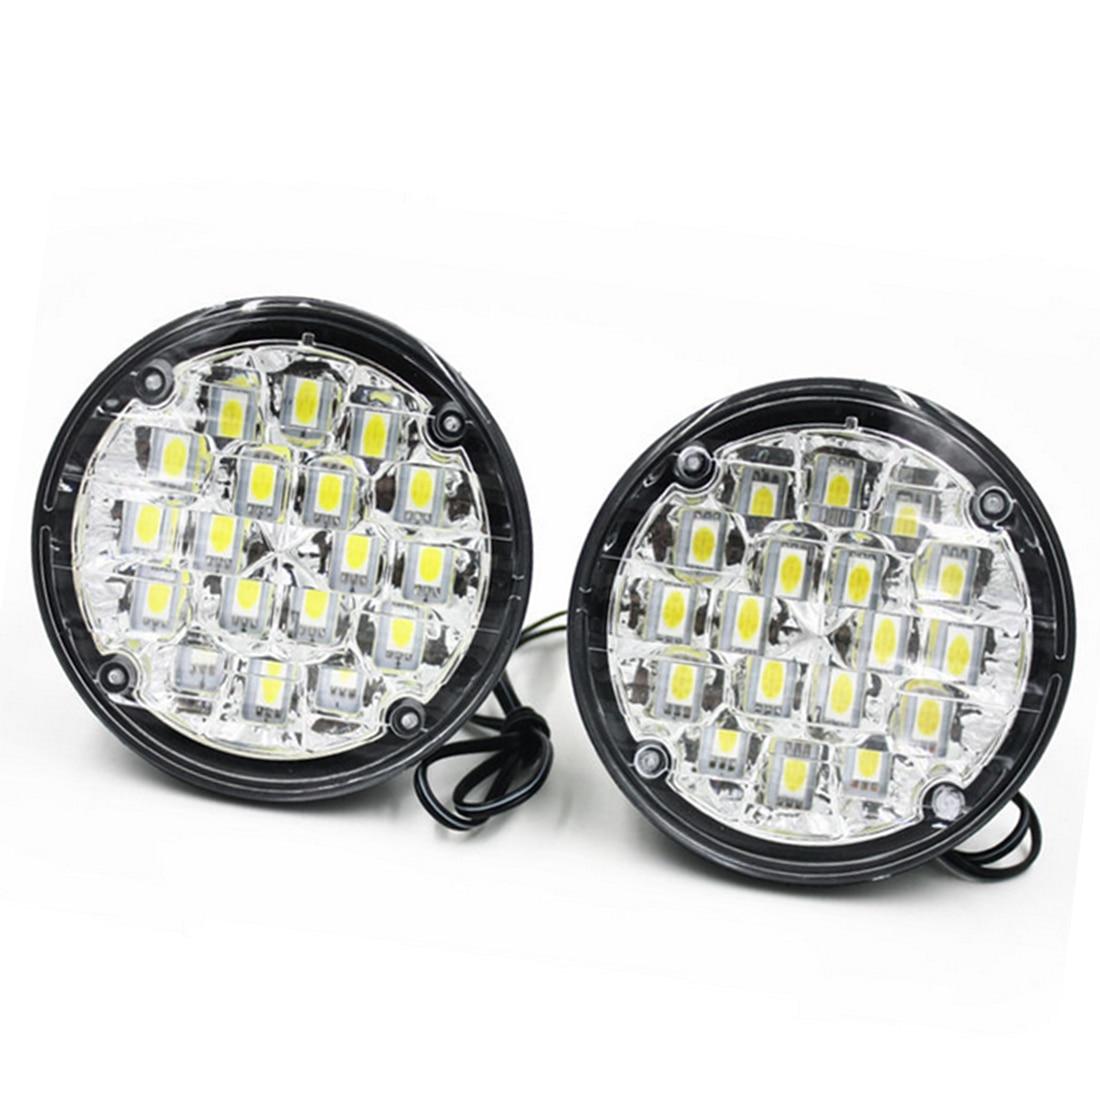 Tonewan super bieten 2 Stücke 12 V 18 LED Runde Auto Driving Daytime ...